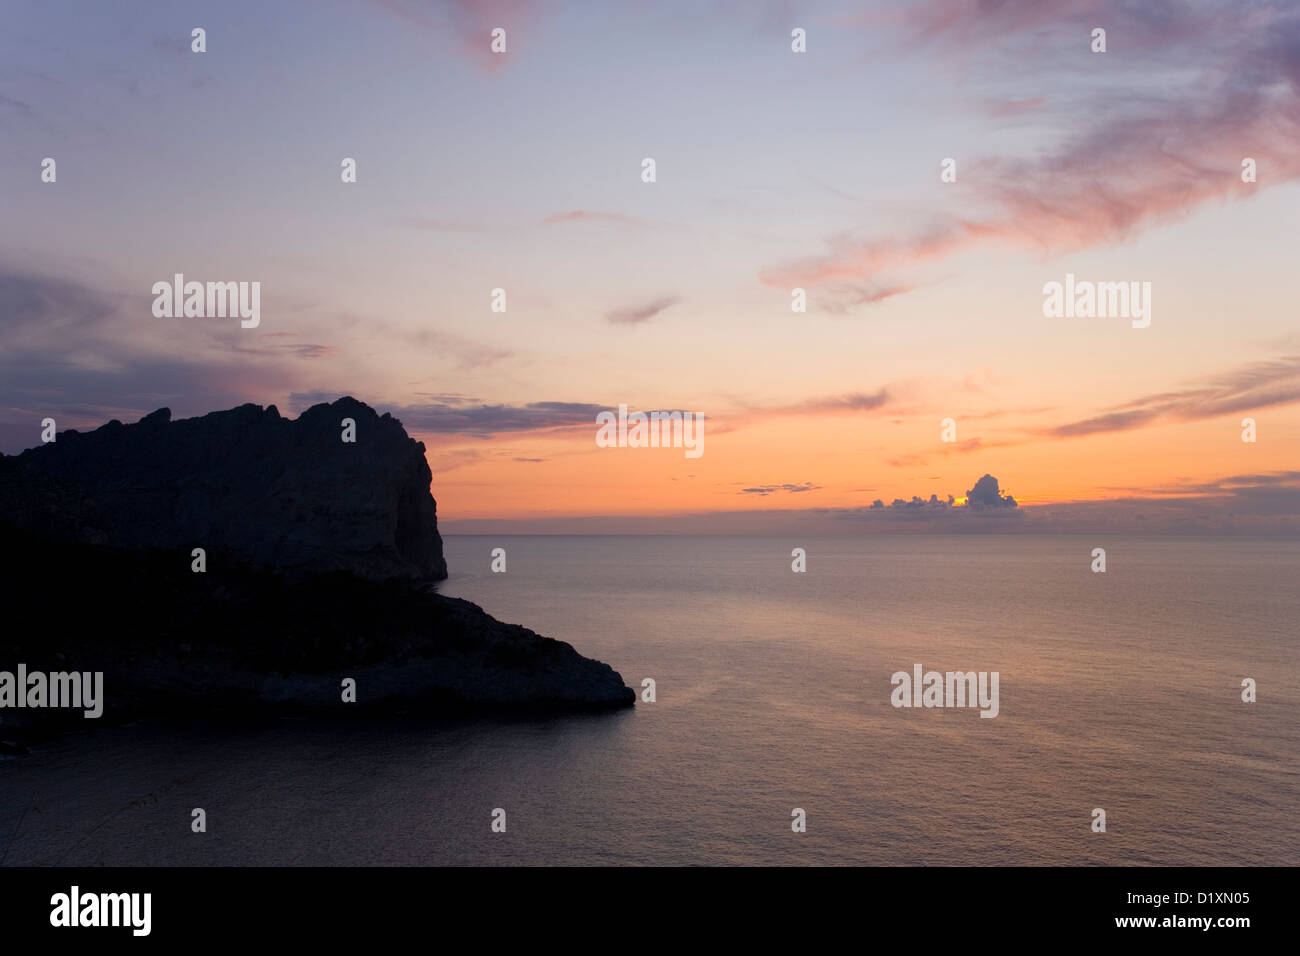 Port de Pollença, Mallorca, Balearic Islands, Spain. Pink sky over the Mediterranean after sunset, Formentor Peninsula. Stock Photo